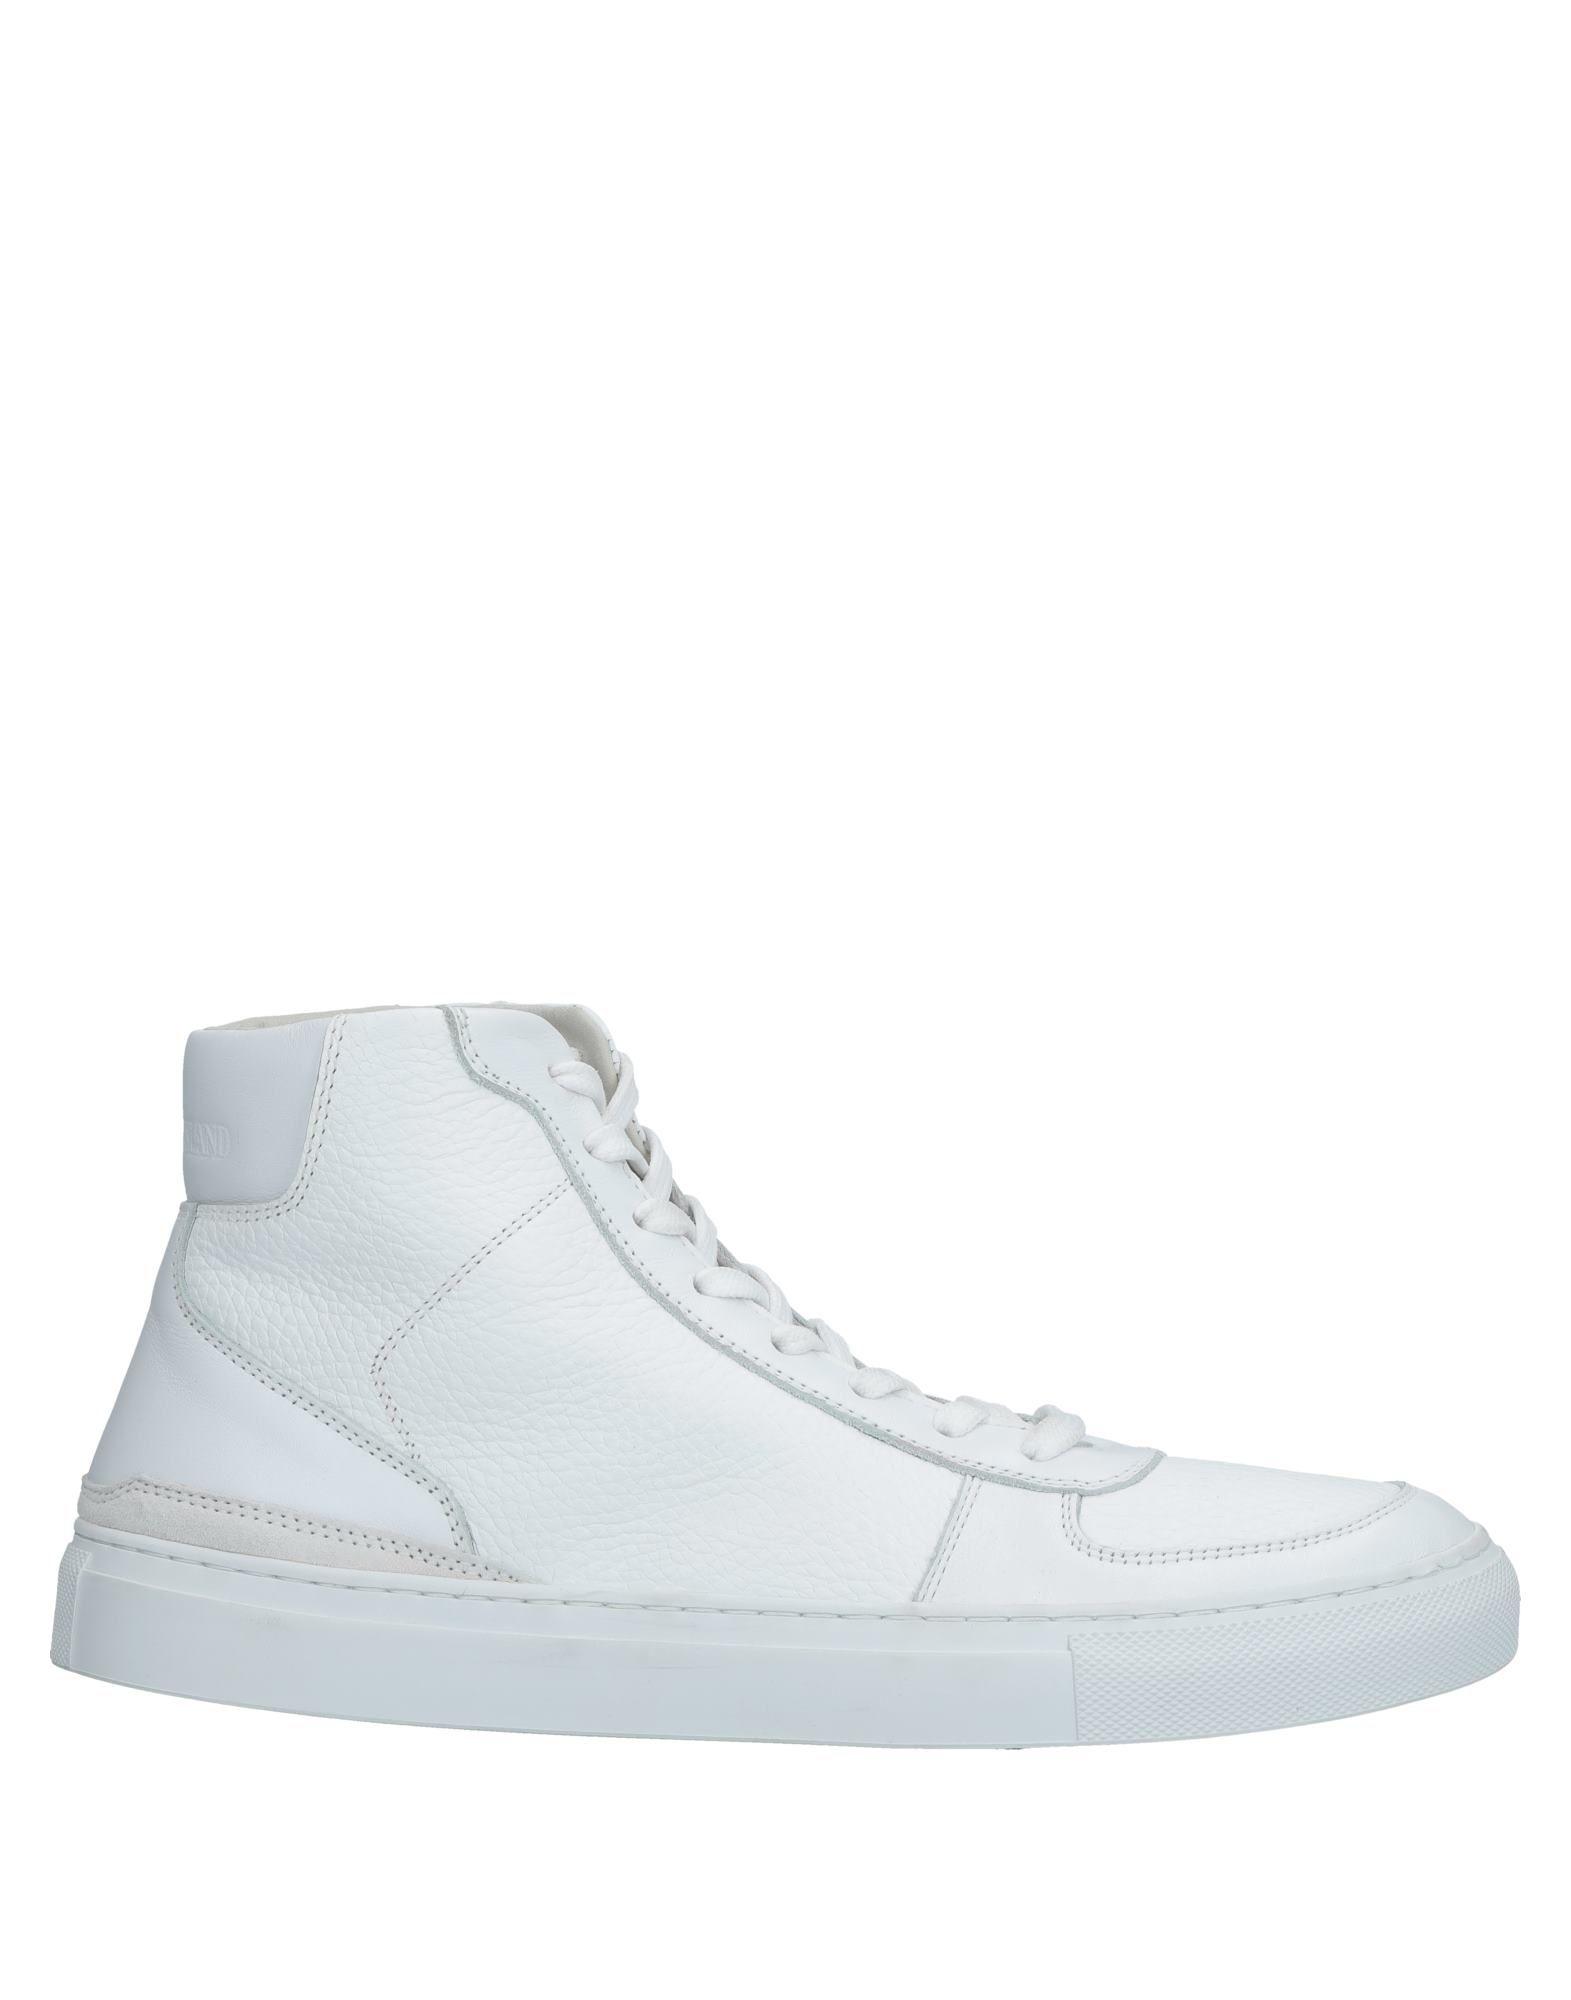 Sneakers Stone Island By Diemme Uomo - 11522596RX